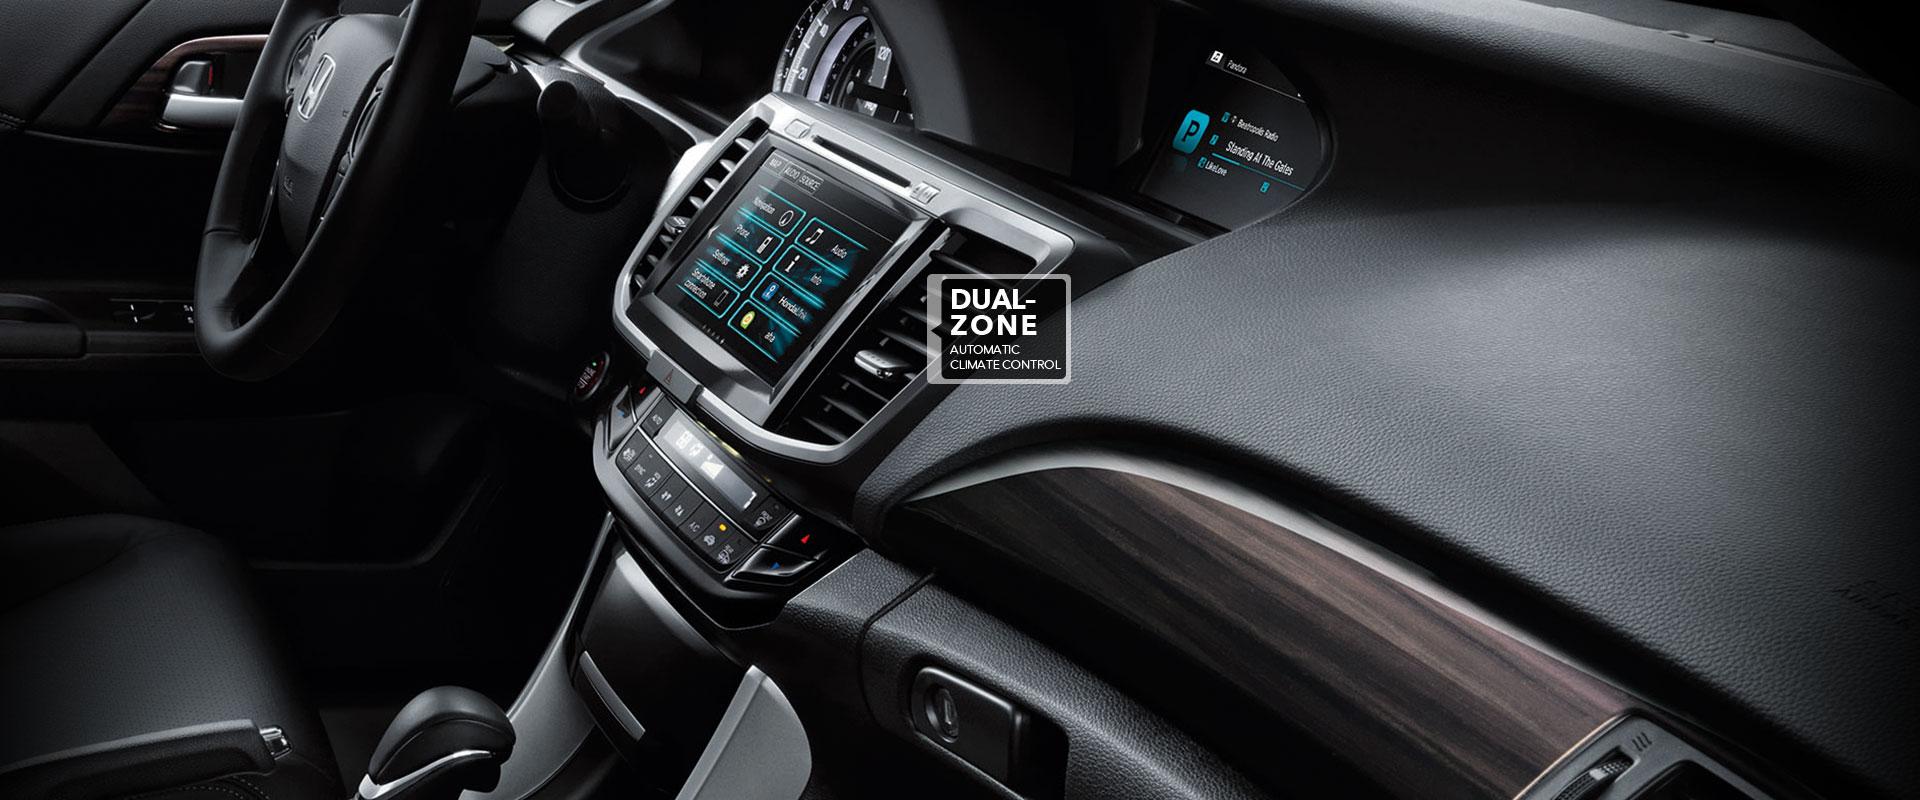 automobiles.honda.com - /images/2016/accord-sedan/features ...